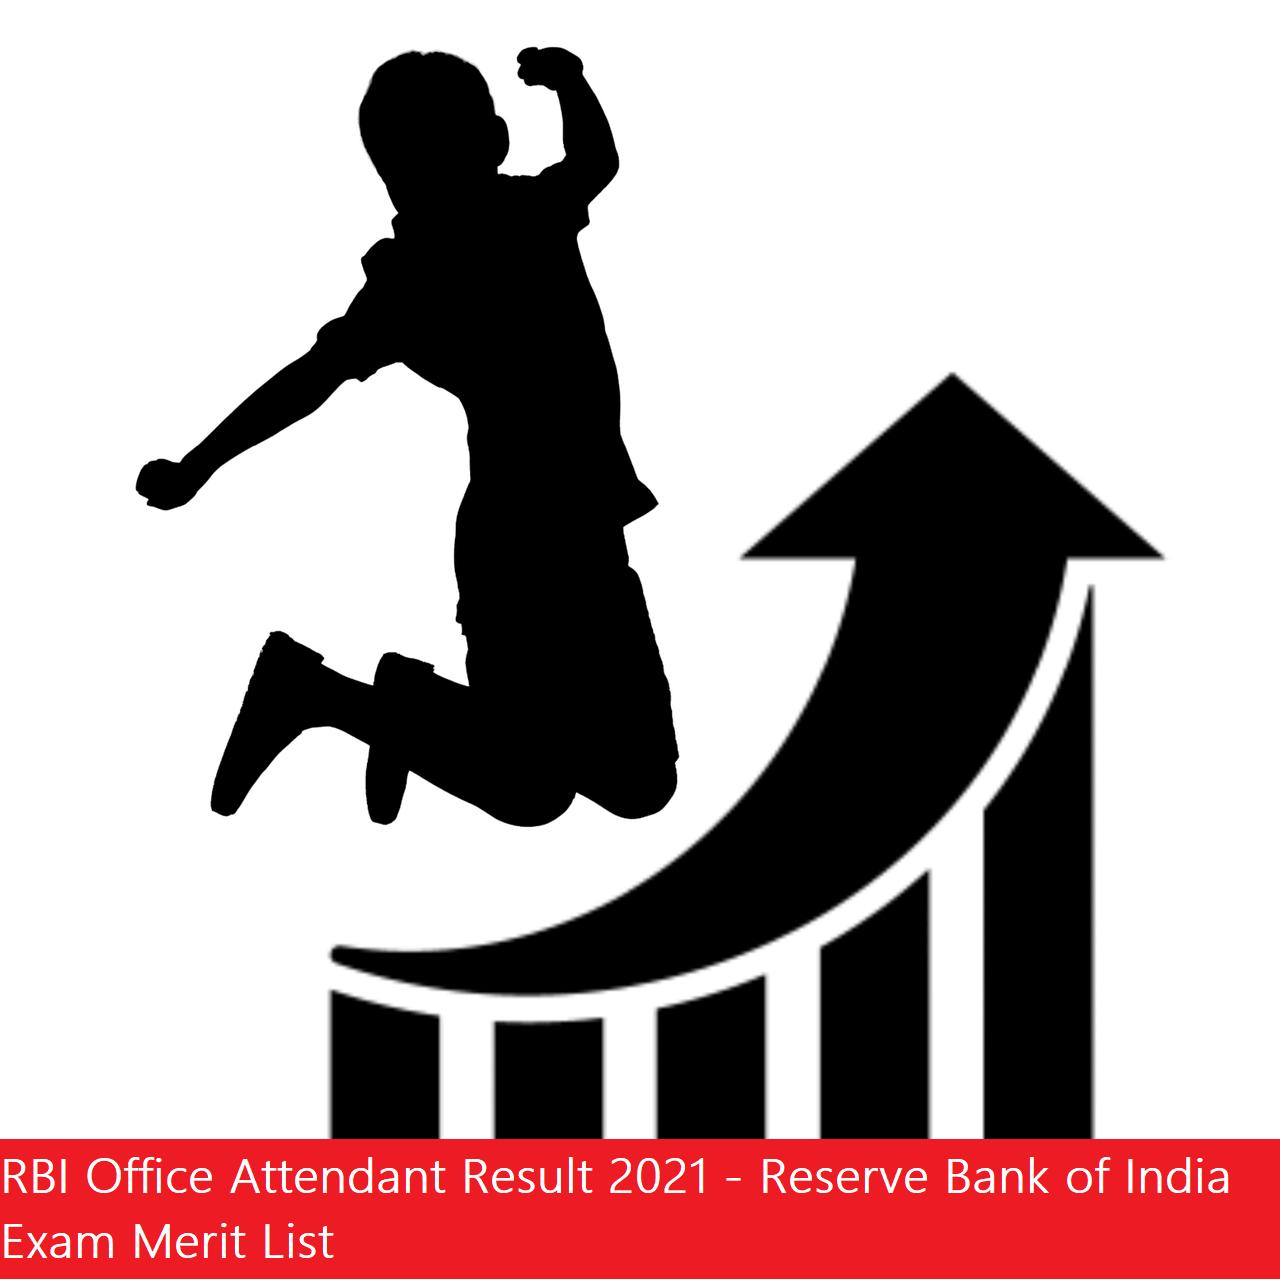 RBI Office Attendant Result